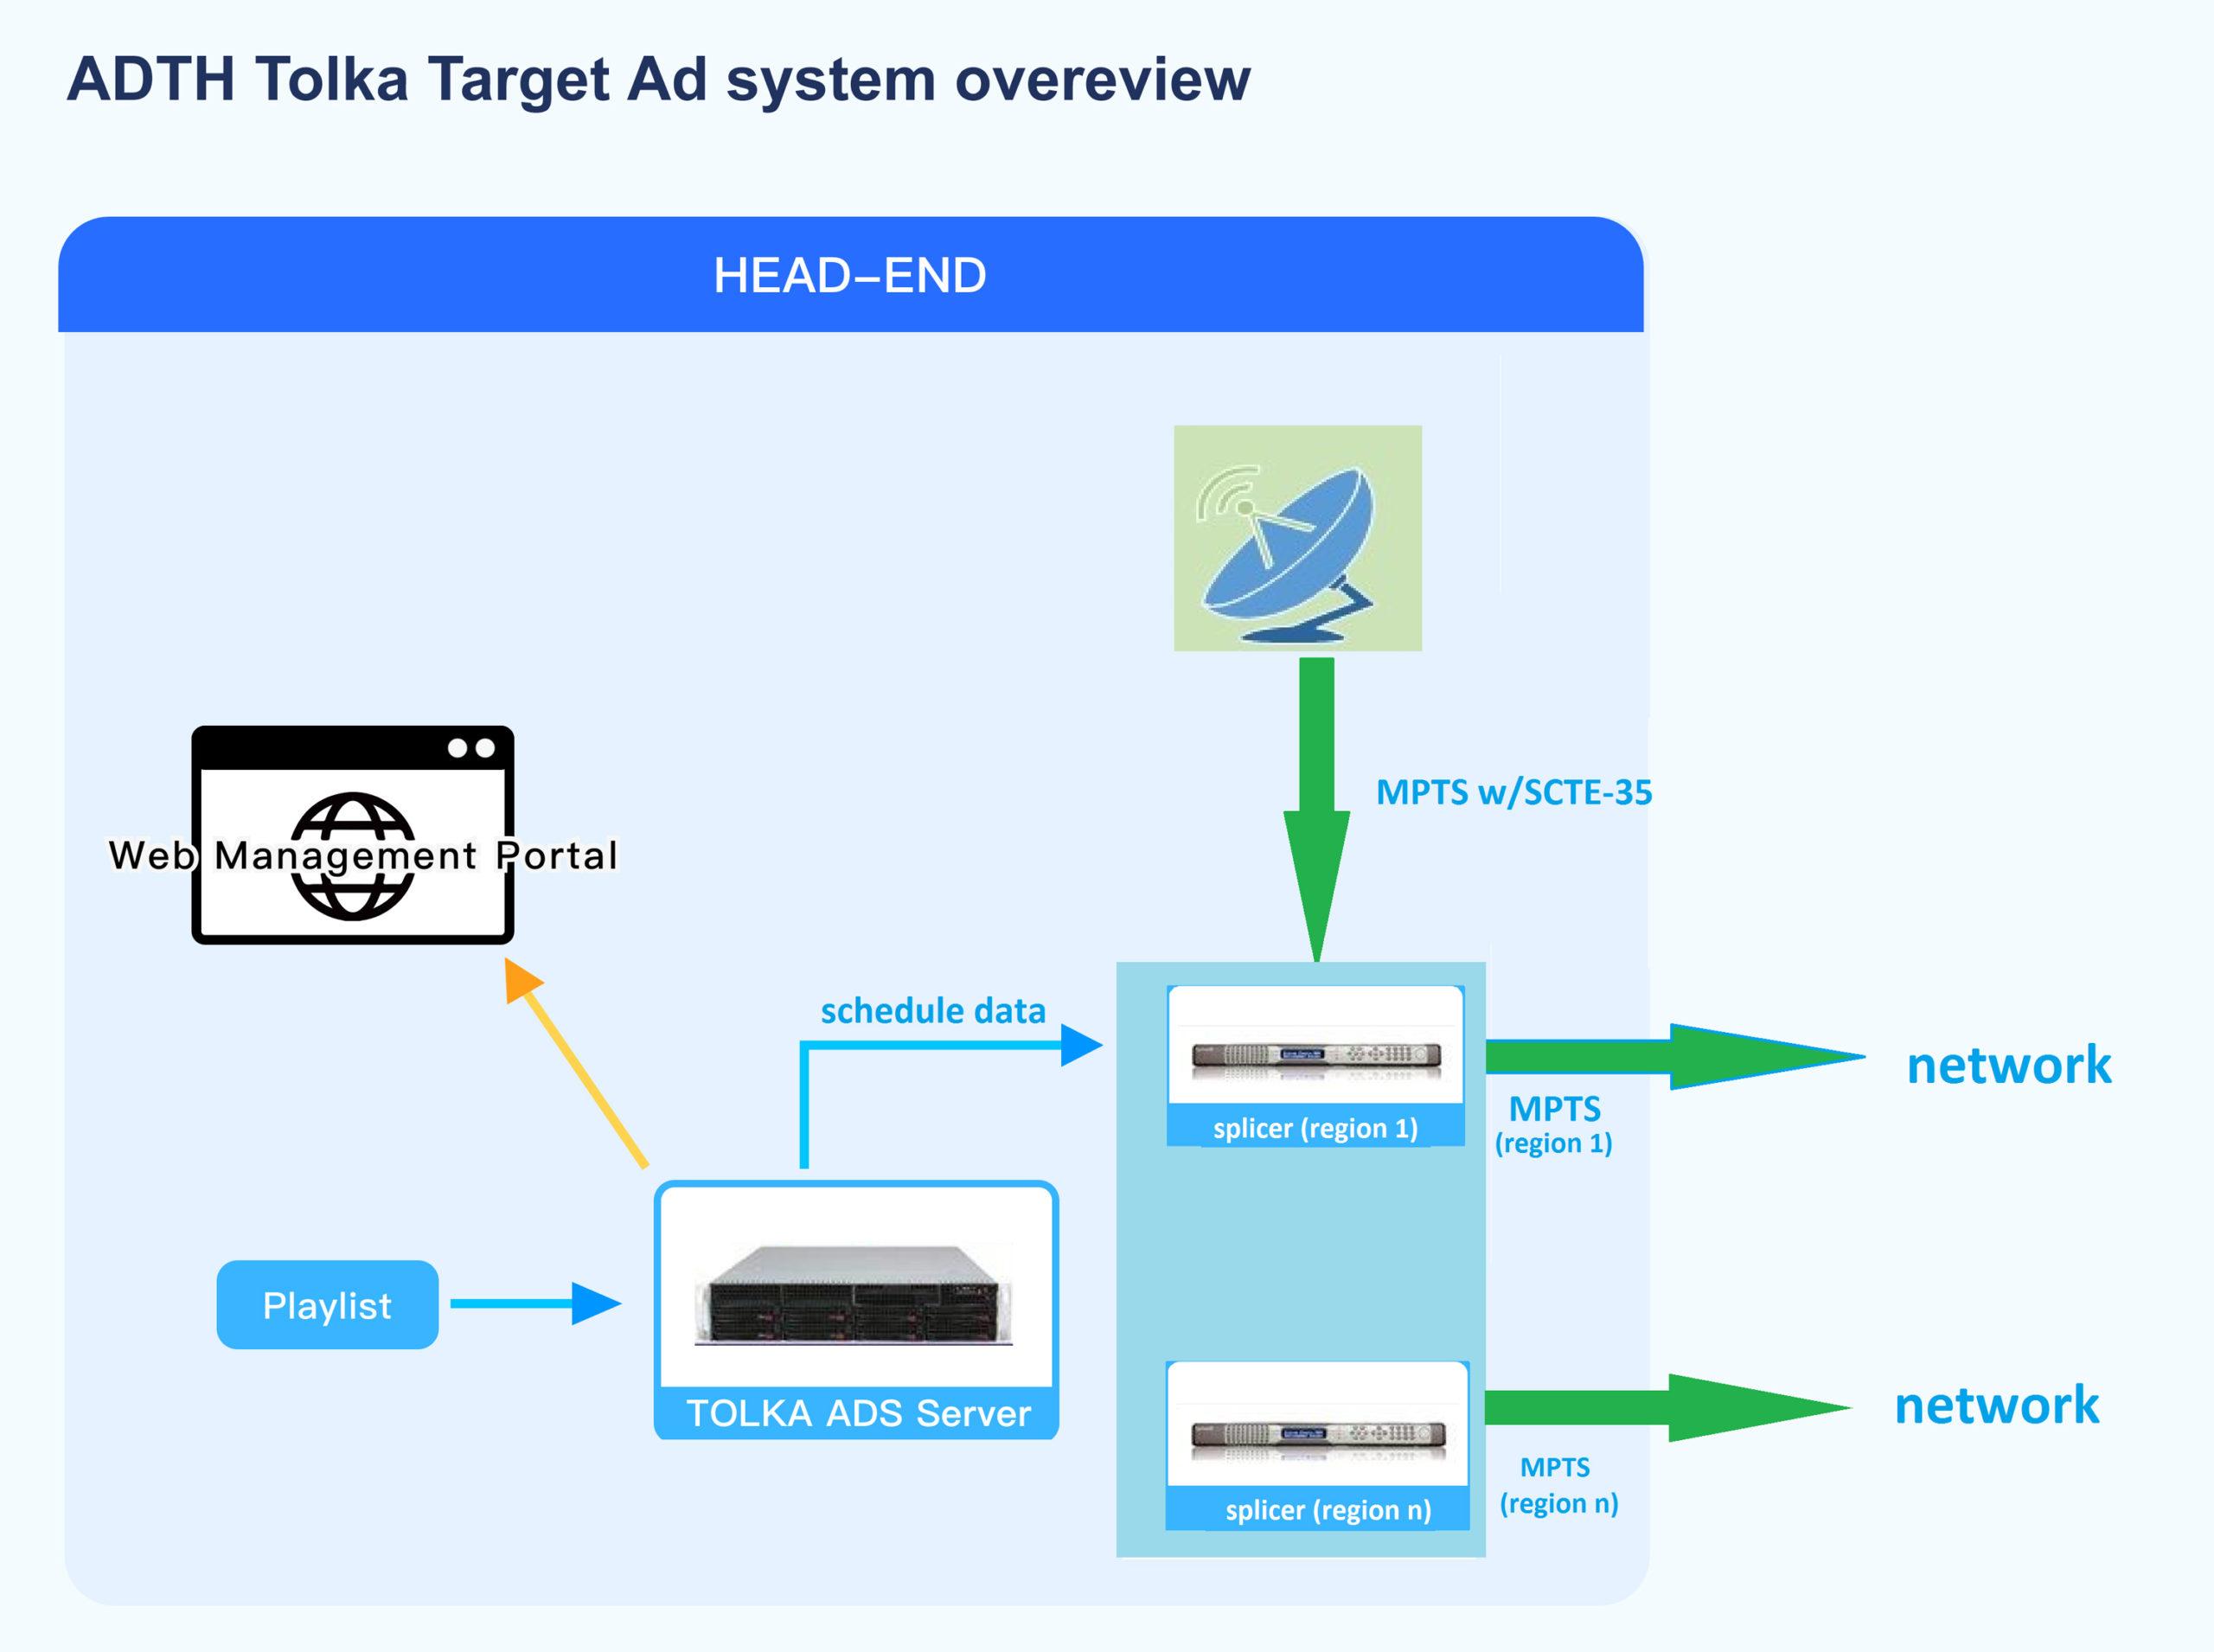 ADTH Tolka Target Ad system overview